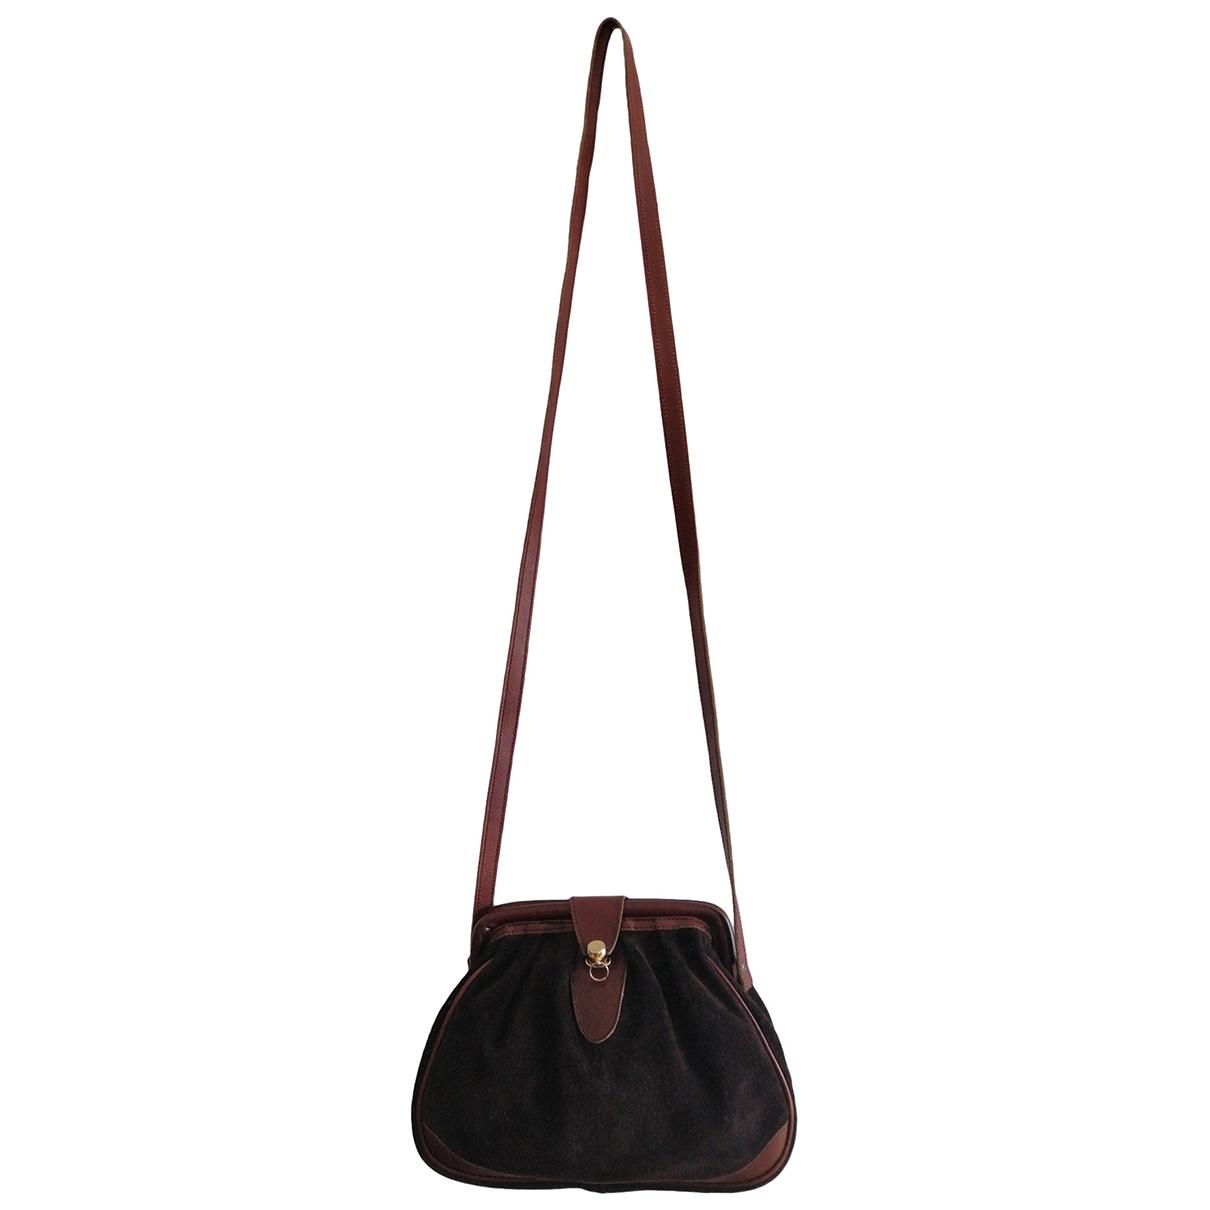 Bruno Magli \N Brown Leather handbag for Women \N